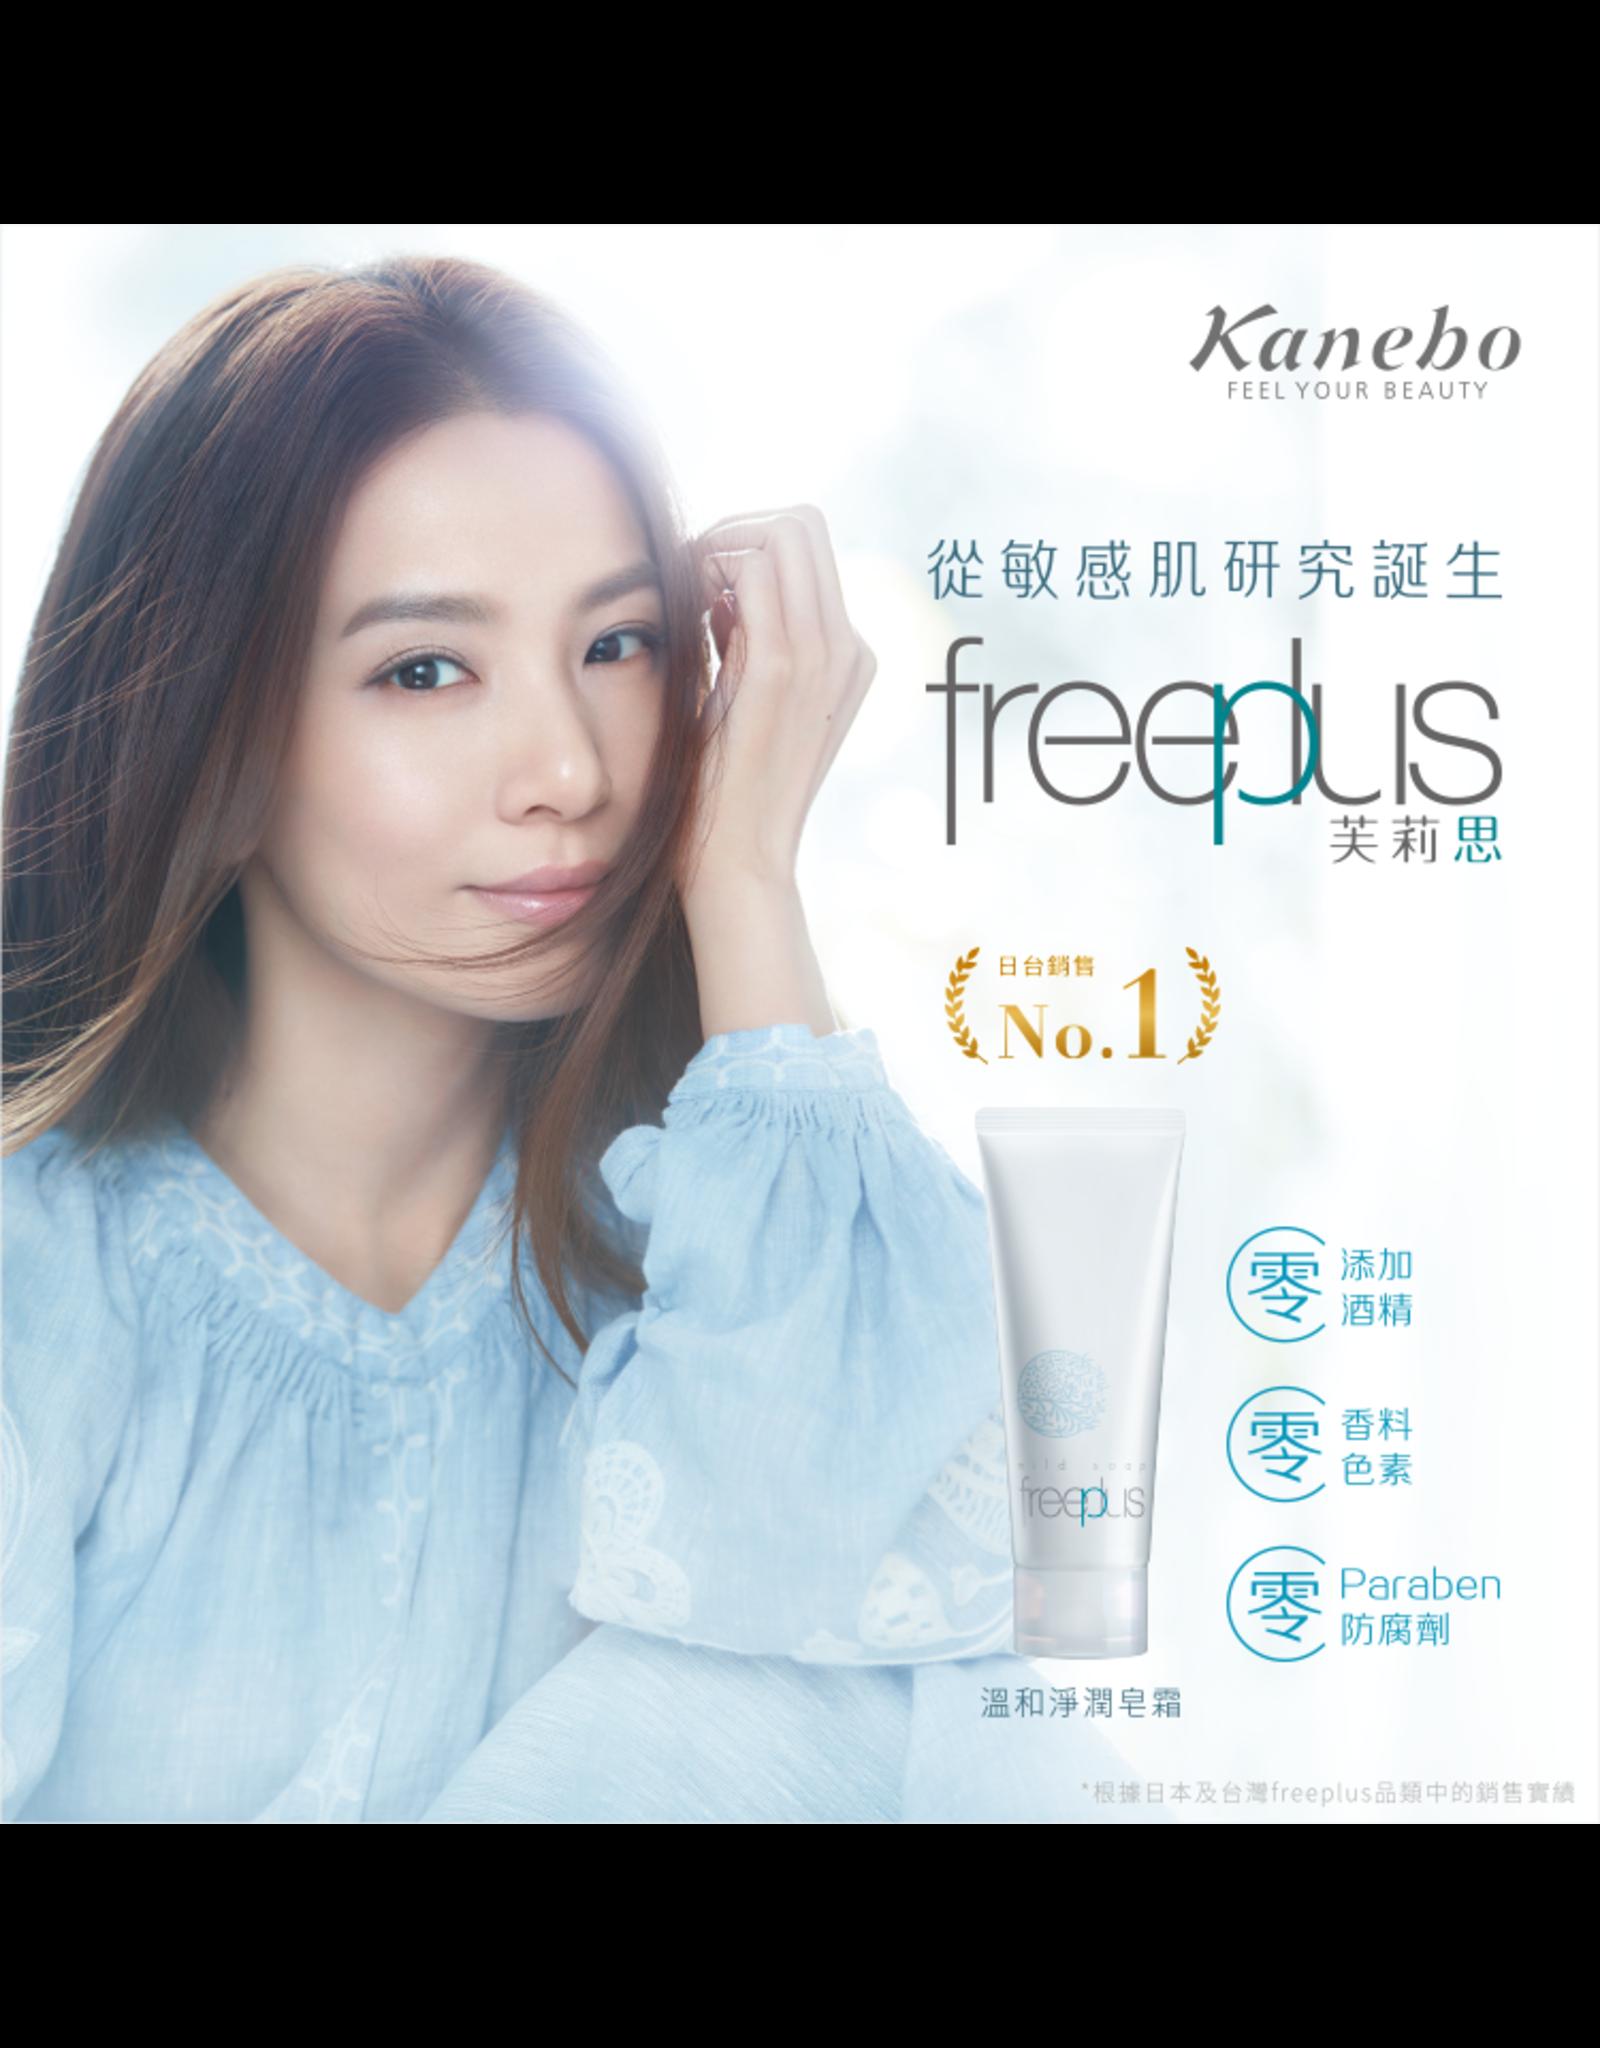 Kanebo Kanebo Freeplus Mild Face Wash